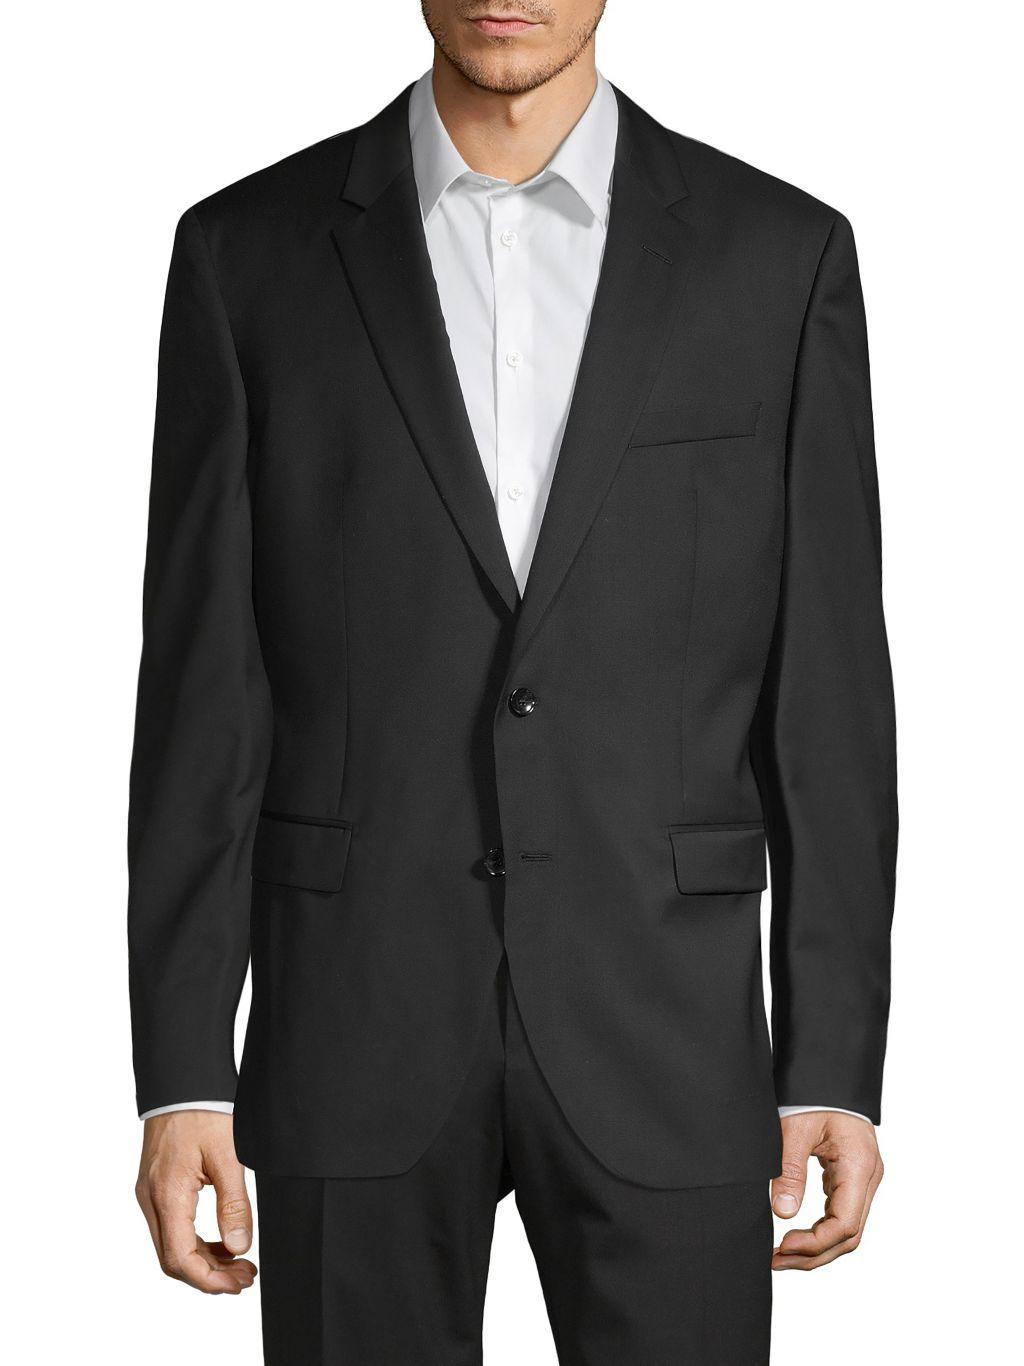 Boss Hugo Boss Tailored-Fit Virgin Wool Sport Jacket